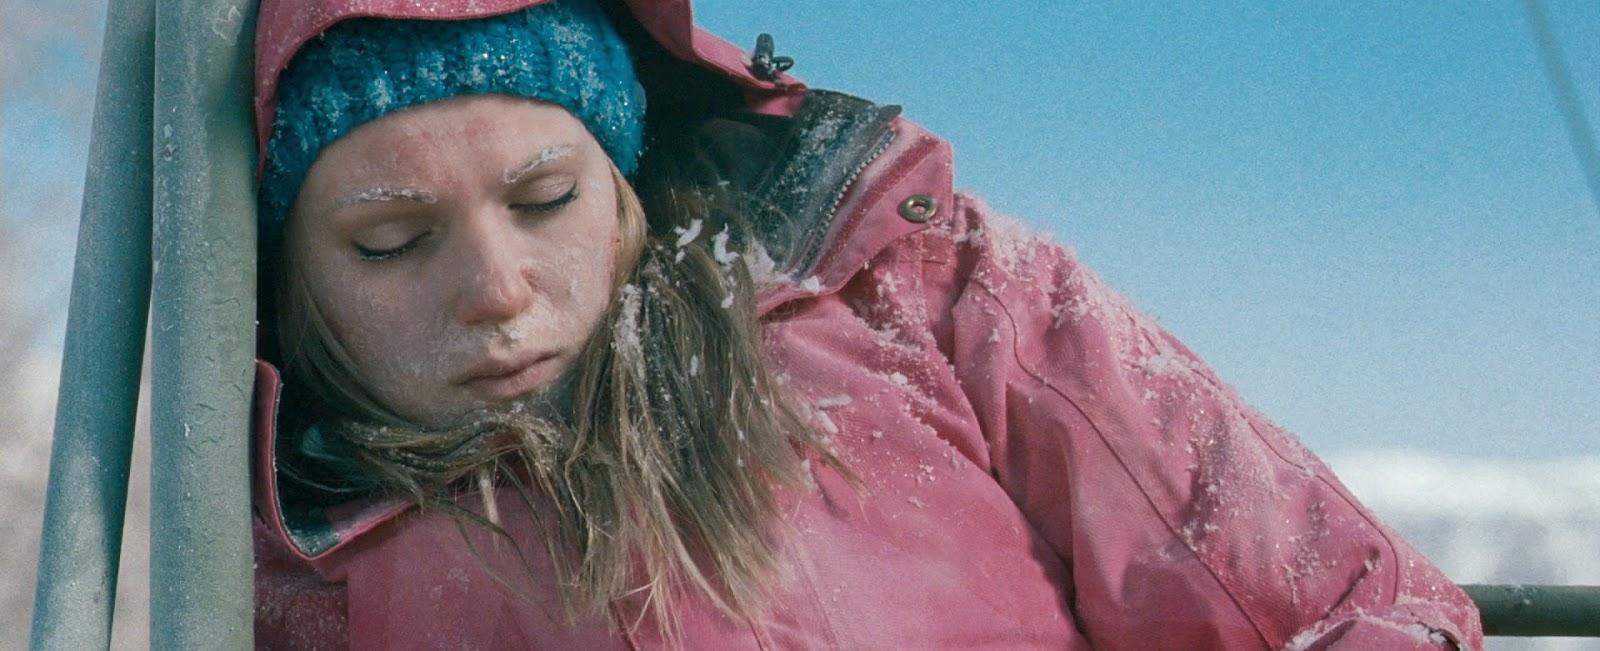 video review : Frozen